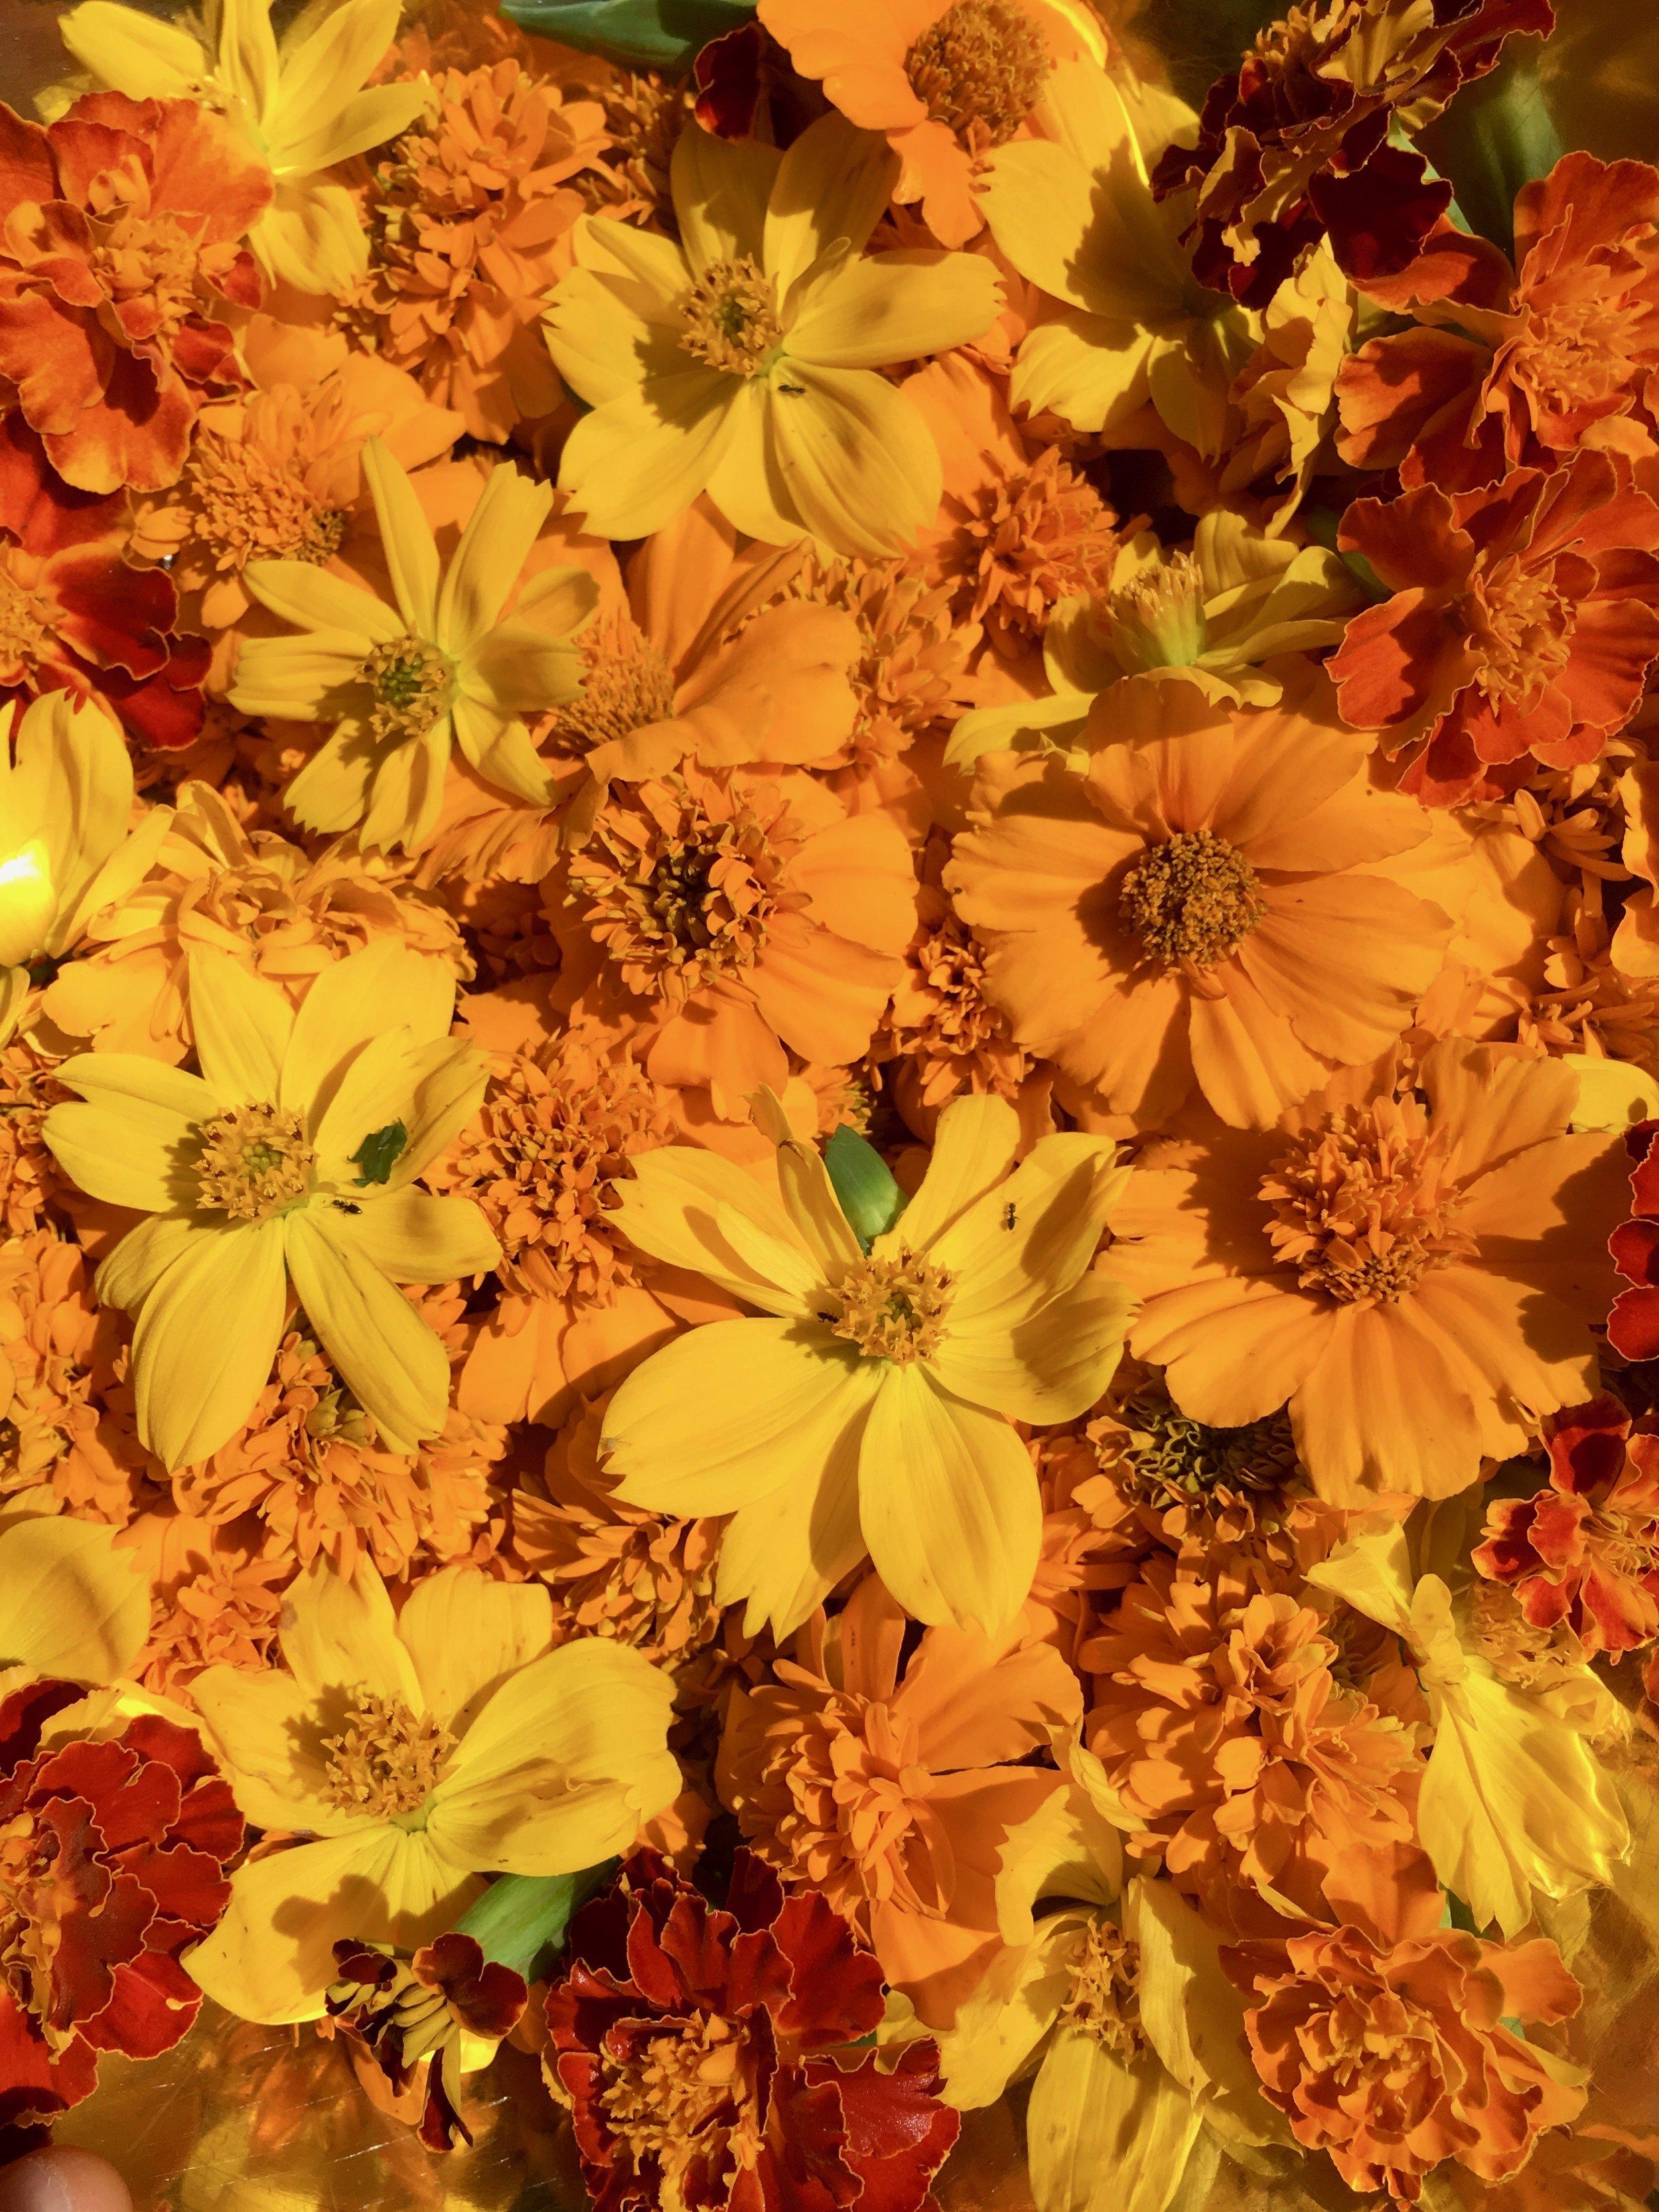 Merigods The Sacred flower of the maya goddess Ix Chel